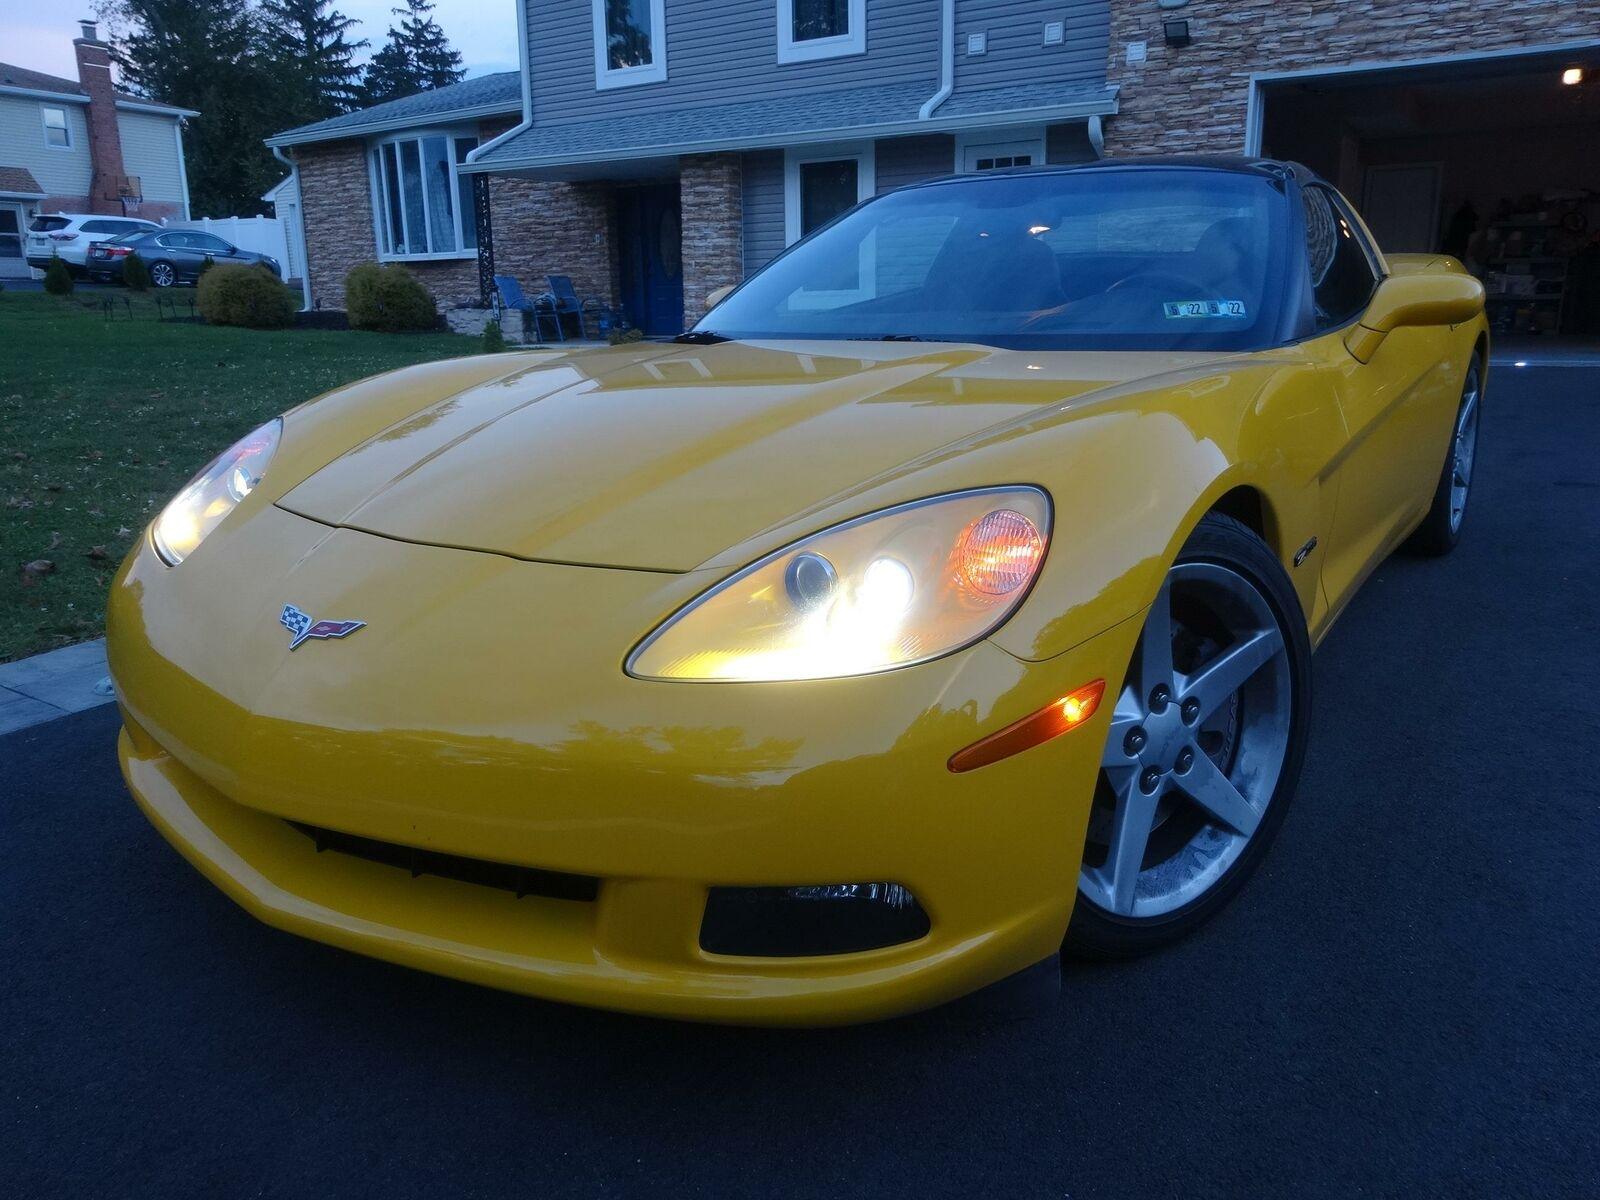 2005 Yellow Chevrolet Corvette     C6 Corvette Photo 3